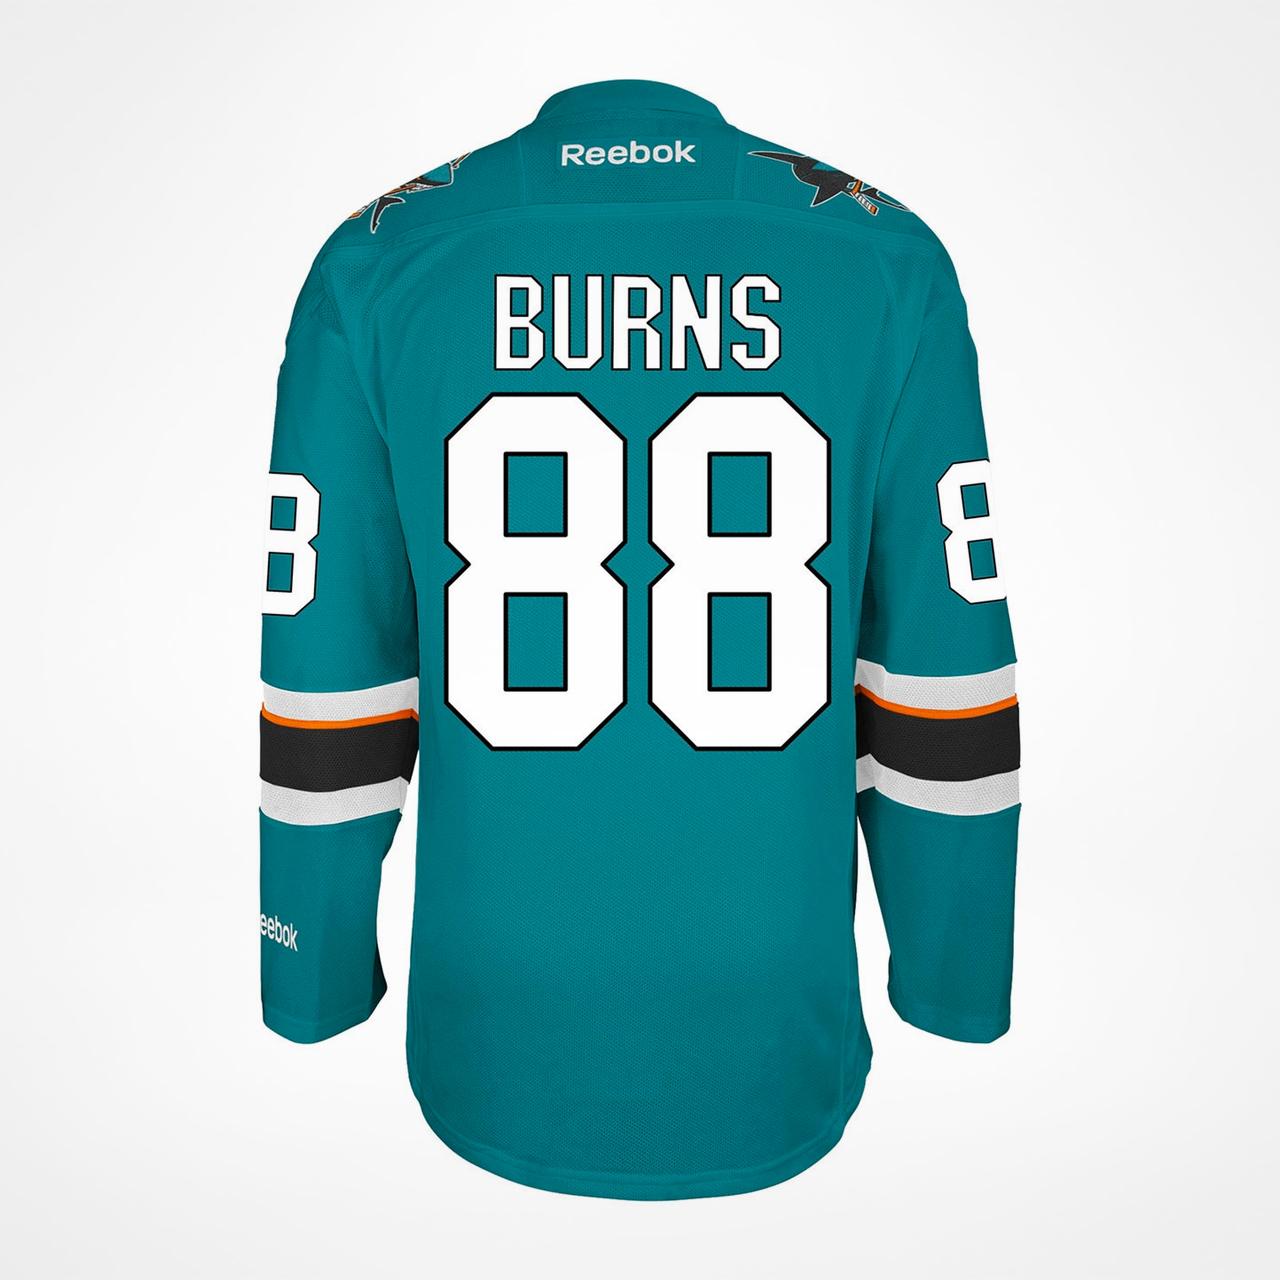 San Jose Sharks Burns 88 Hemmatröja Premier 2016/17 - SupportersPlace